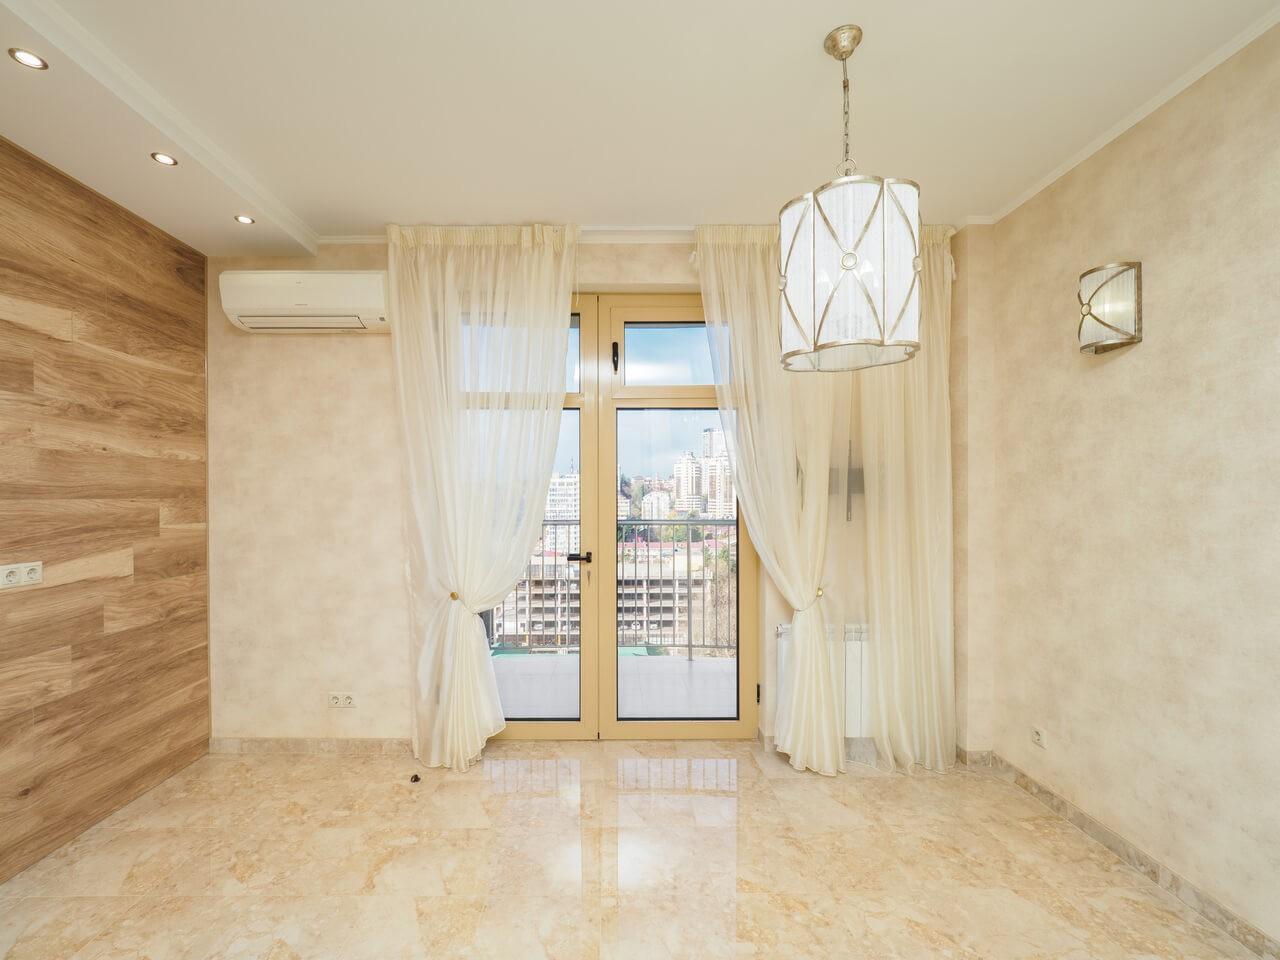 Продажа 3-х комнатной квартиры по ул. Роз, 52 (110 м²)